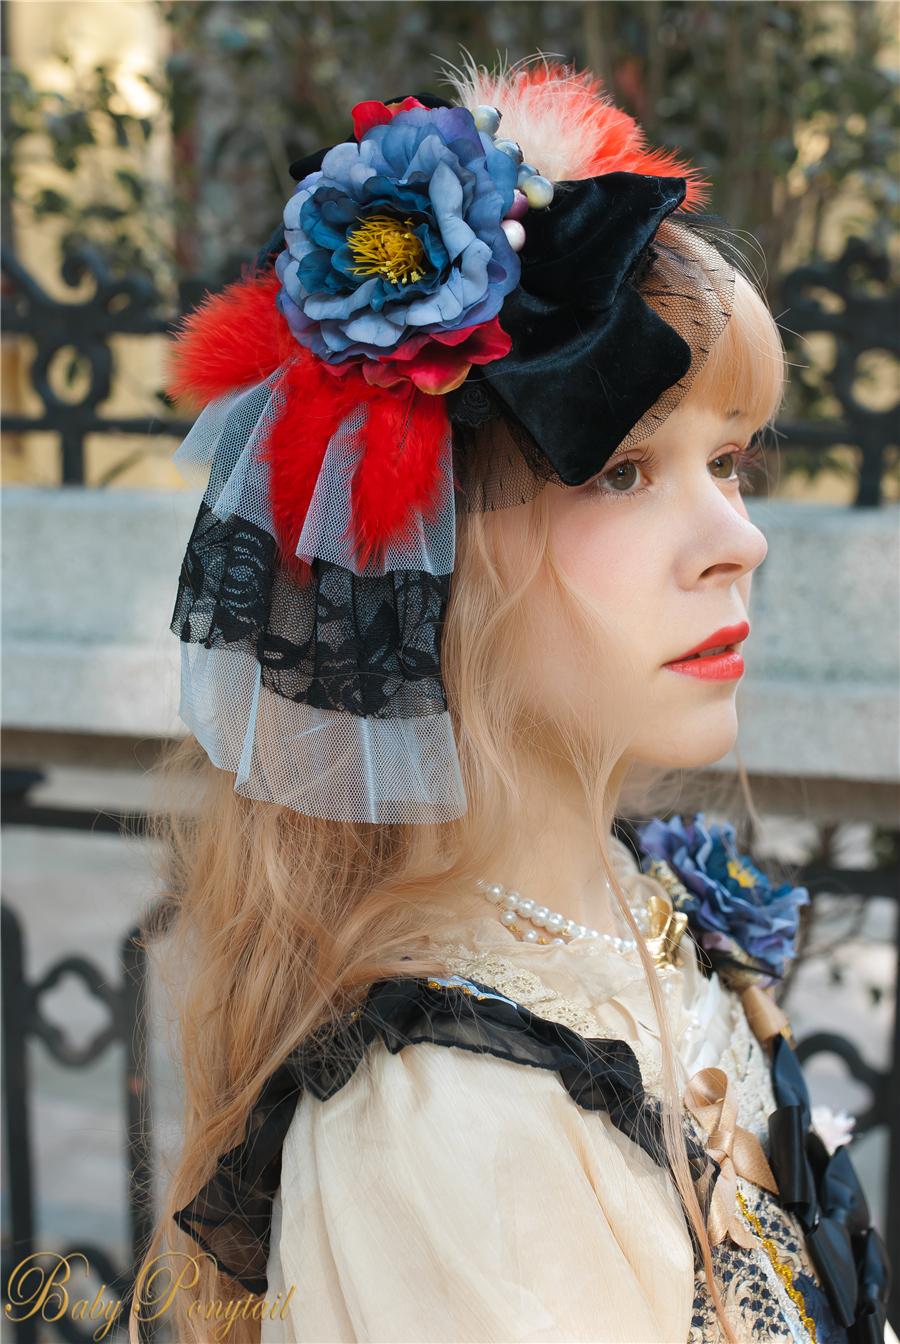 Baby Ponytail_Circus Princess_Black JSK_Claudia_13.jpg